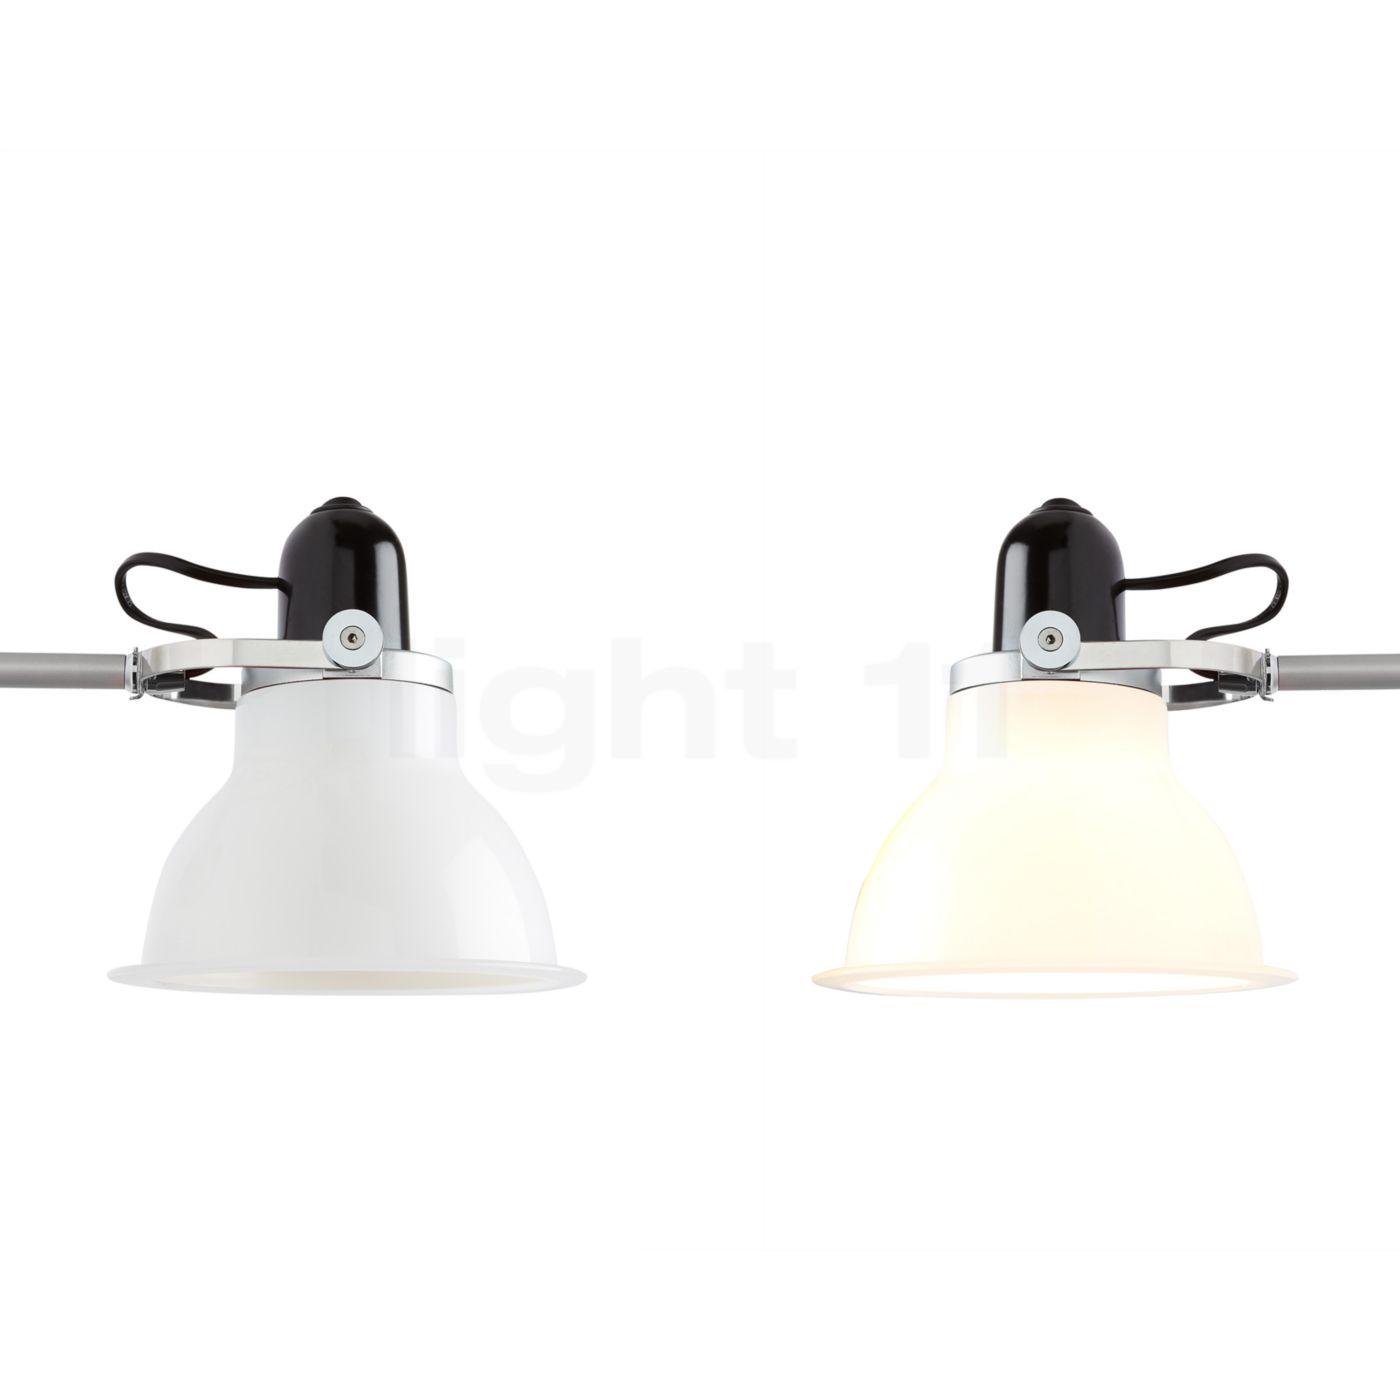 Buy Anglepoise Type 1228 Floor lamp at light11.eu